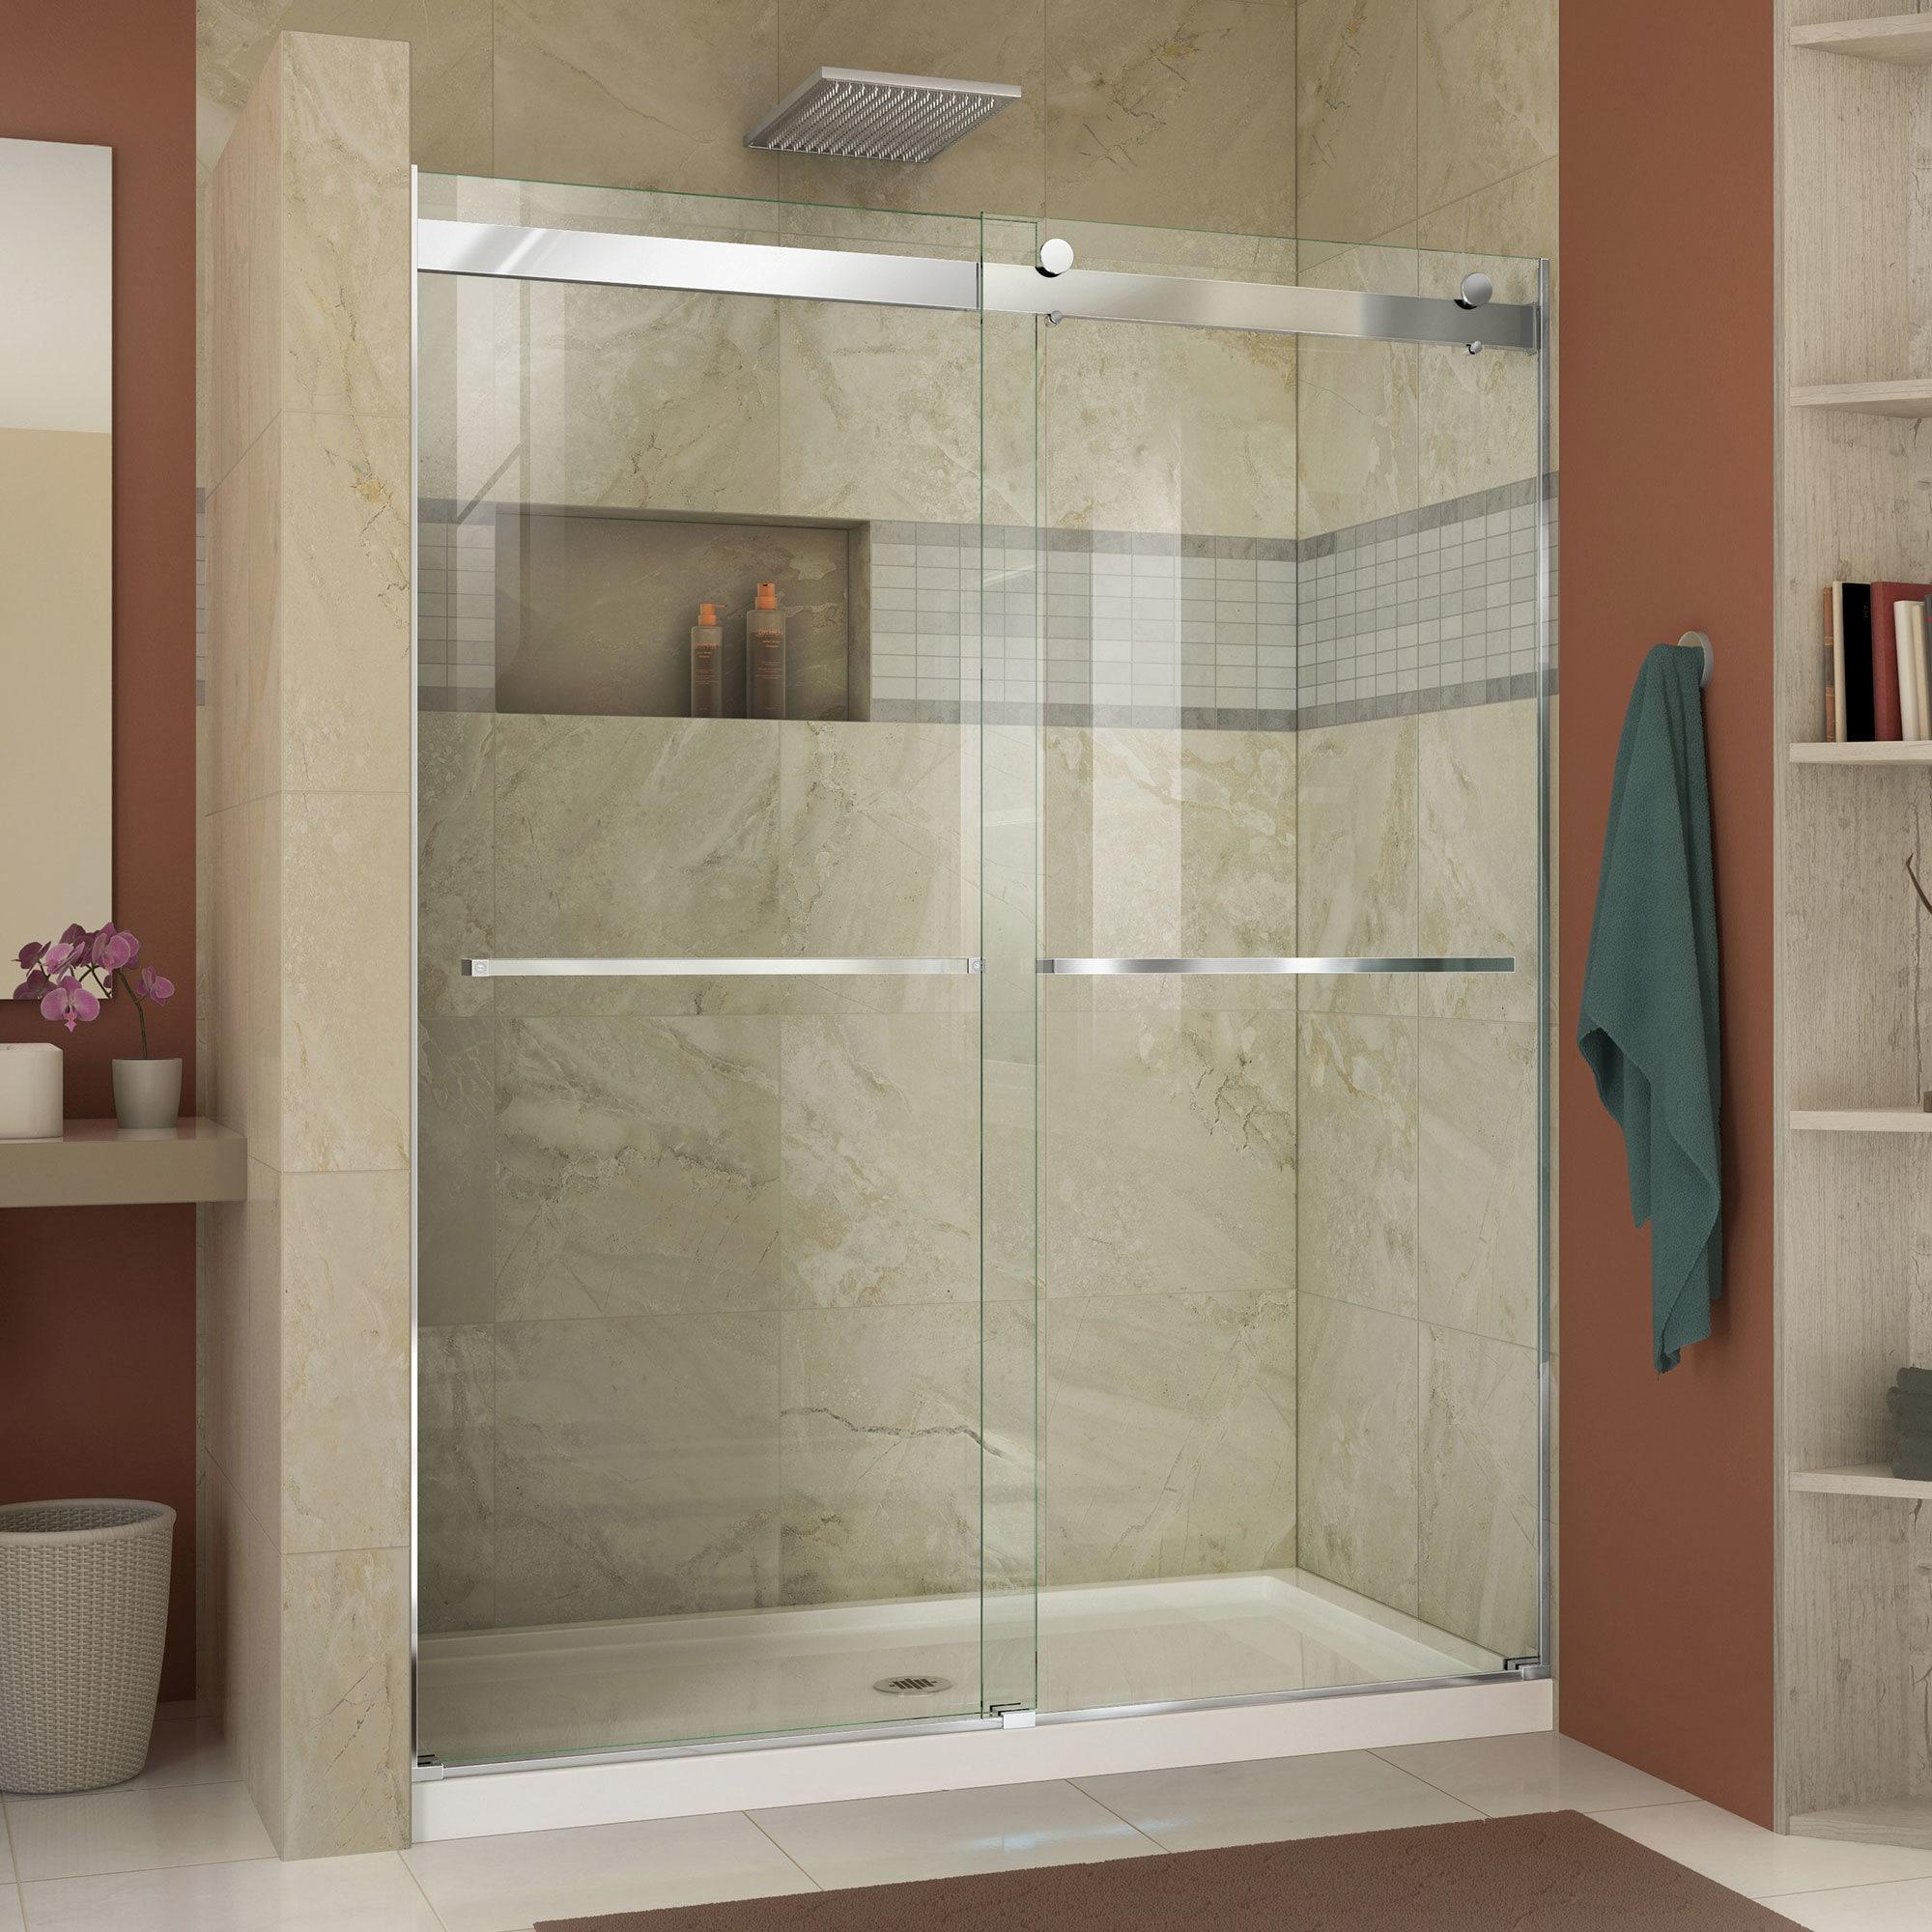 Shop DreamLine Essence 44 to 48 in. Frameless Bypass Shower Door ...